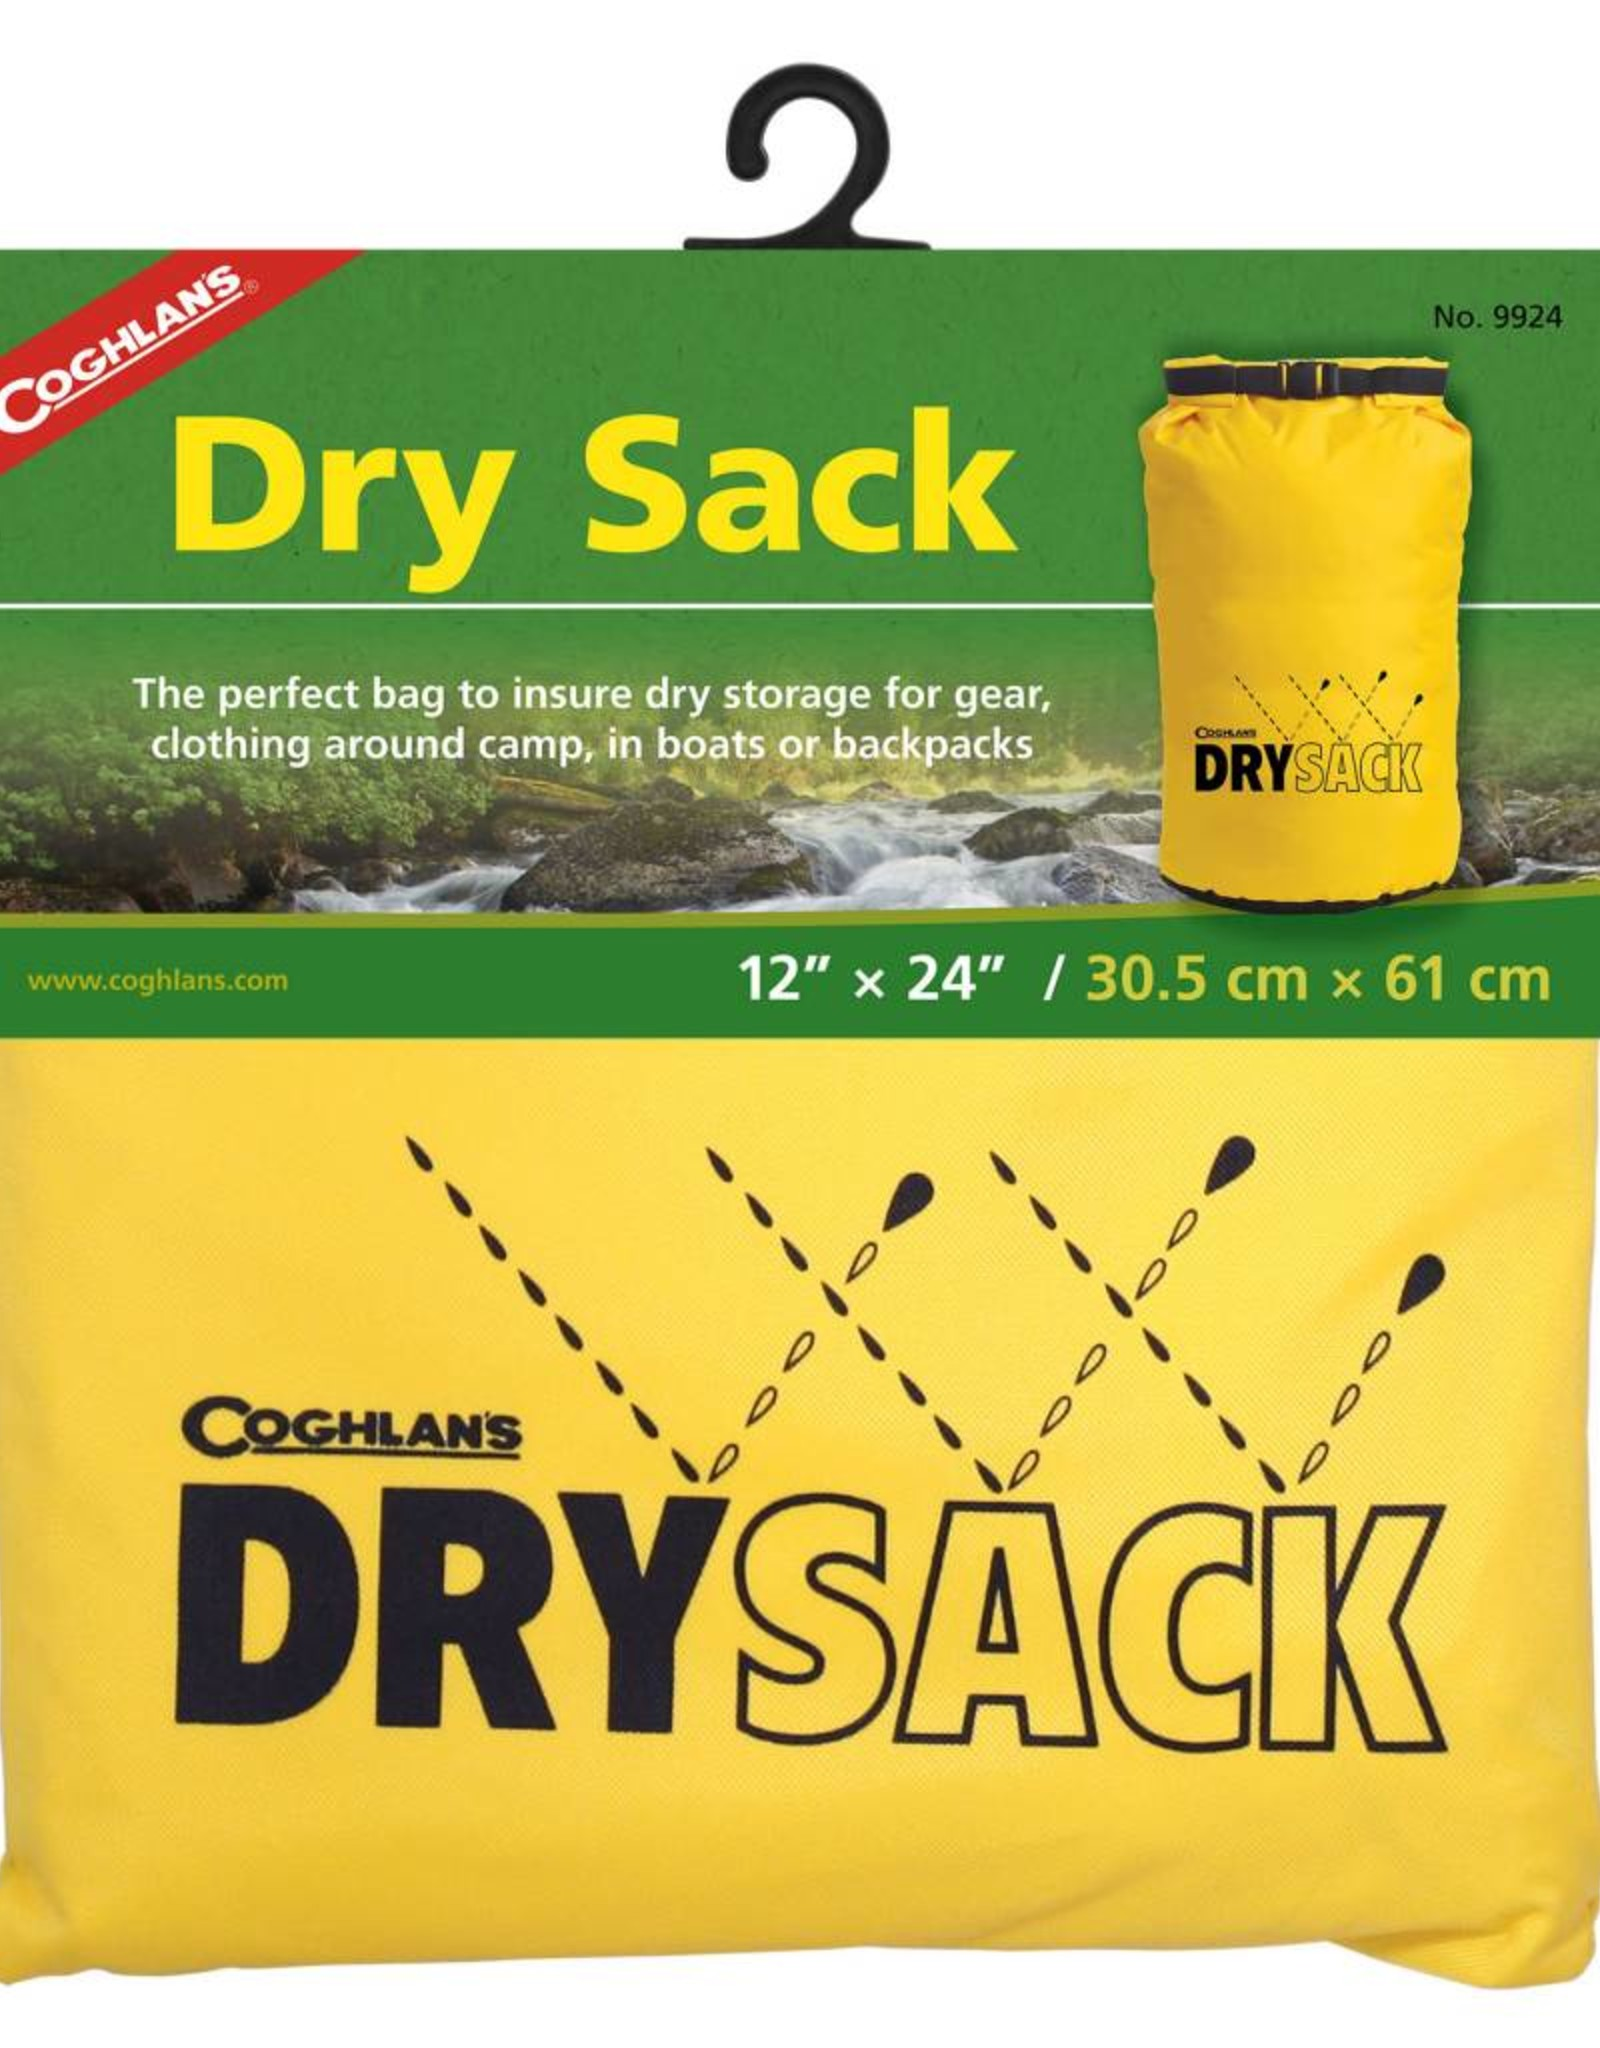 "Coghlan's Coghlan's 12"" x 24"" Roll Top Dry Sack"